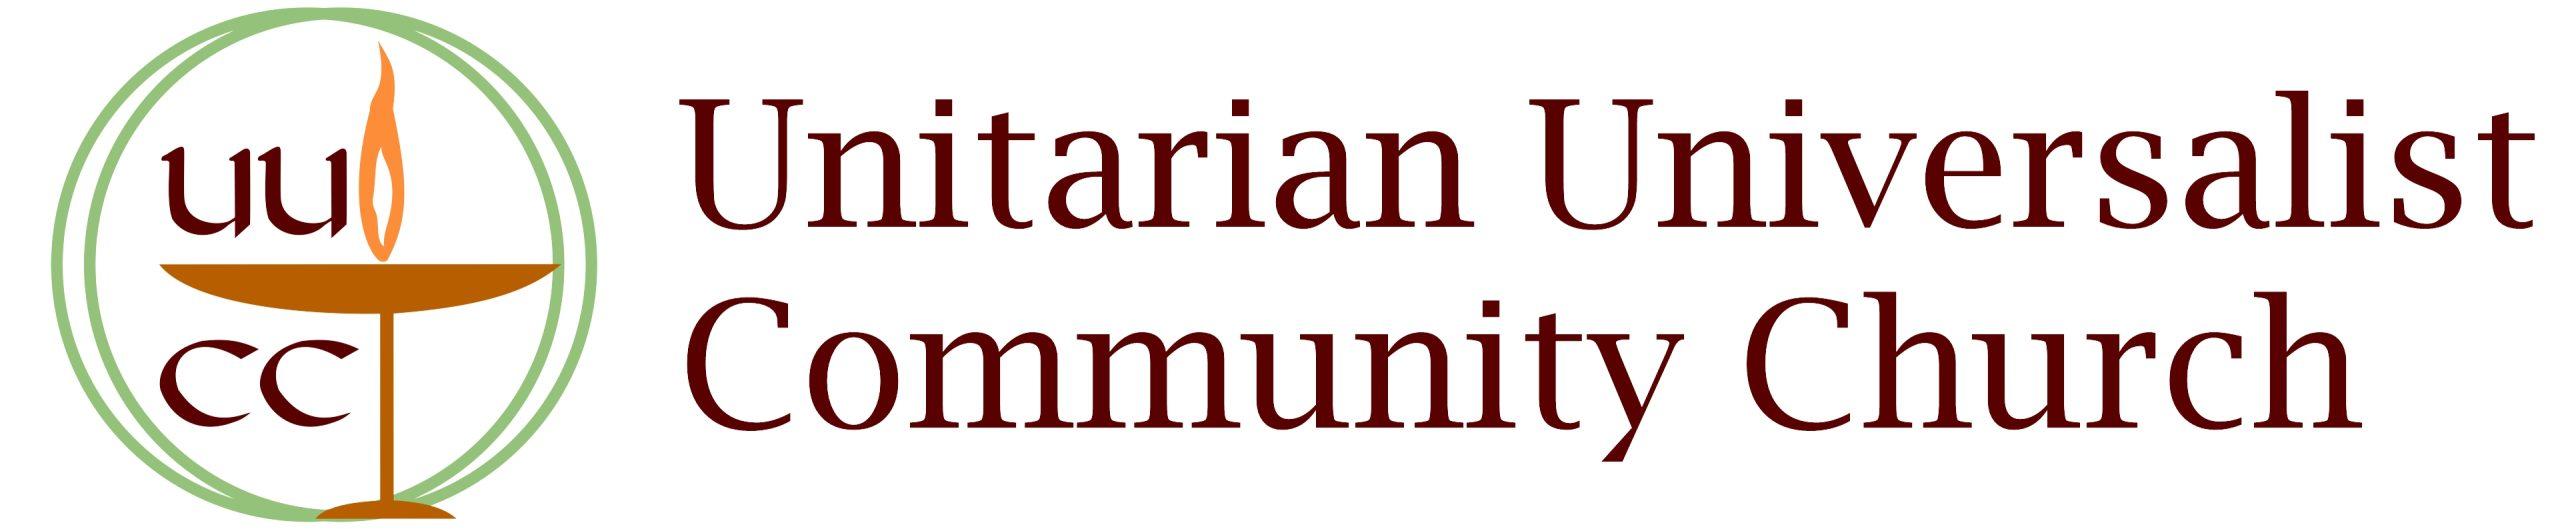 Unitarian Universalist Community Church